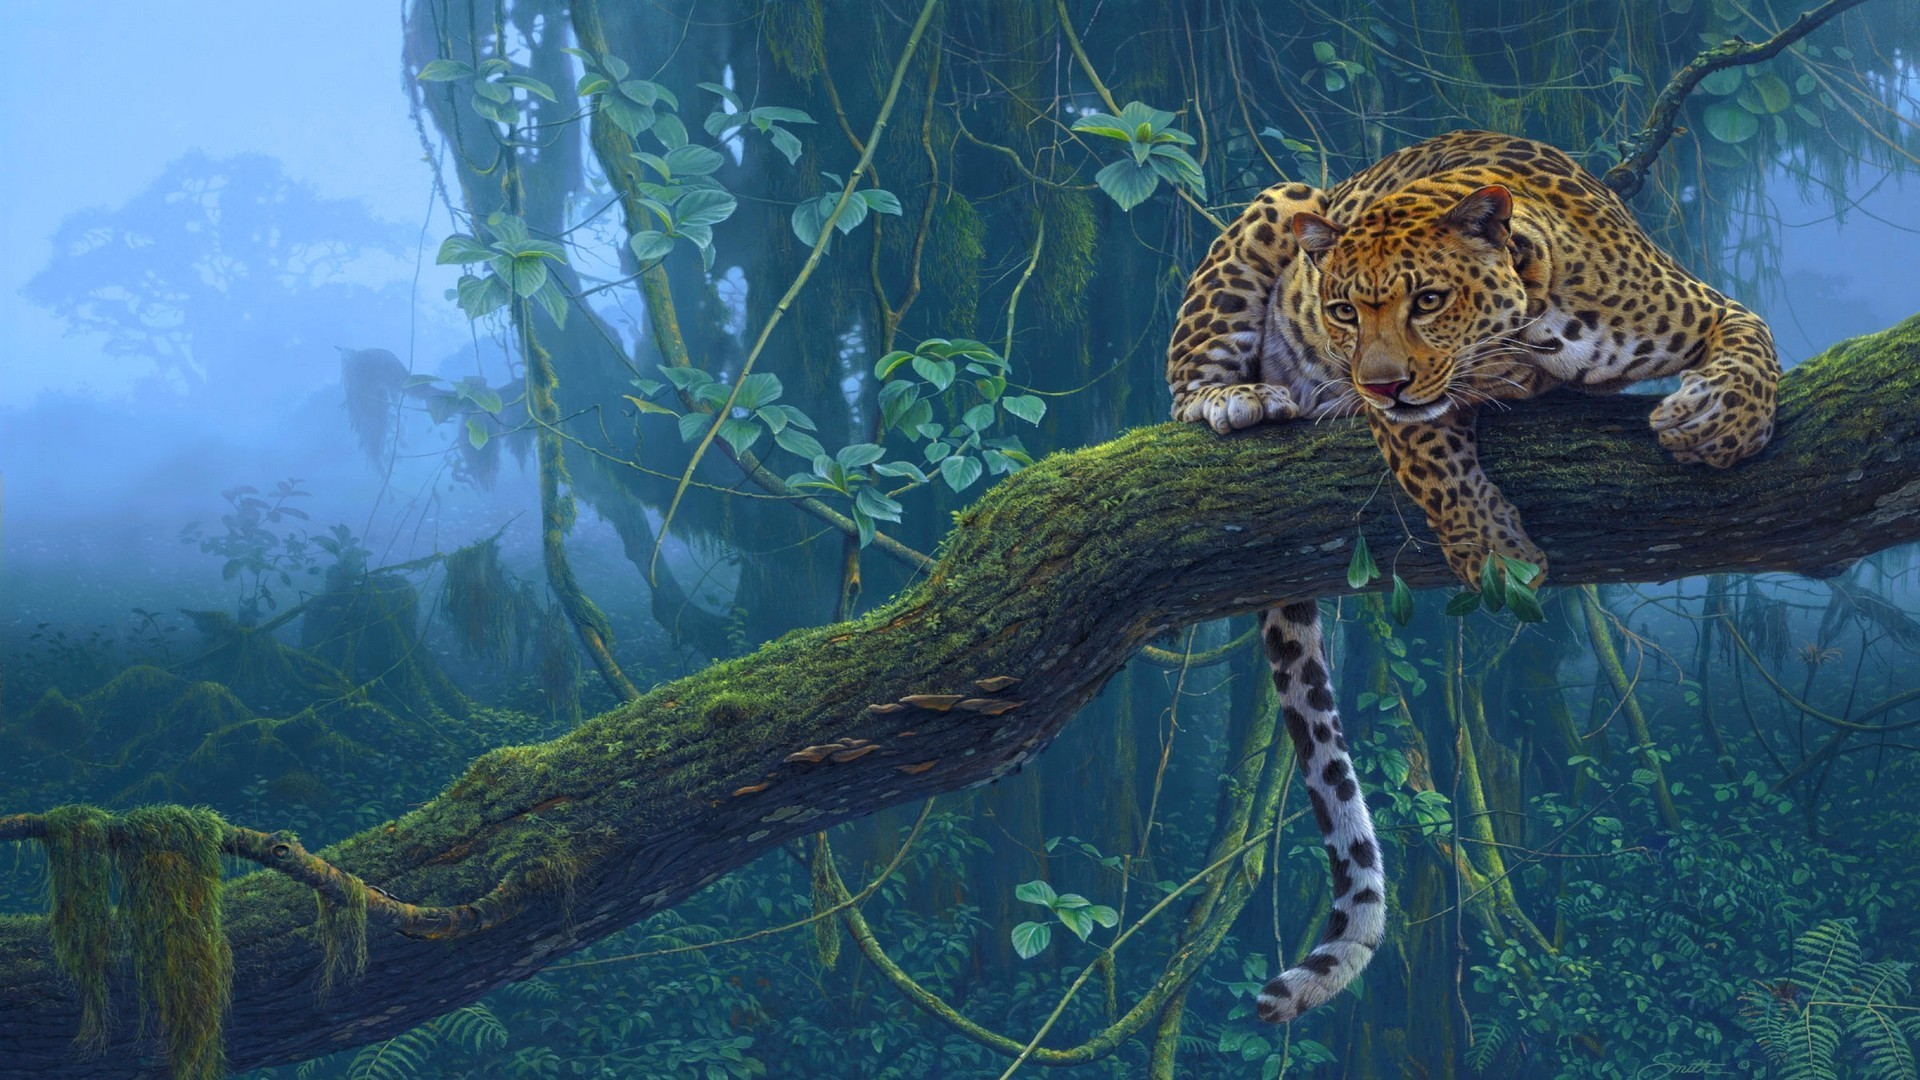 leopard (animal) branch animals trees